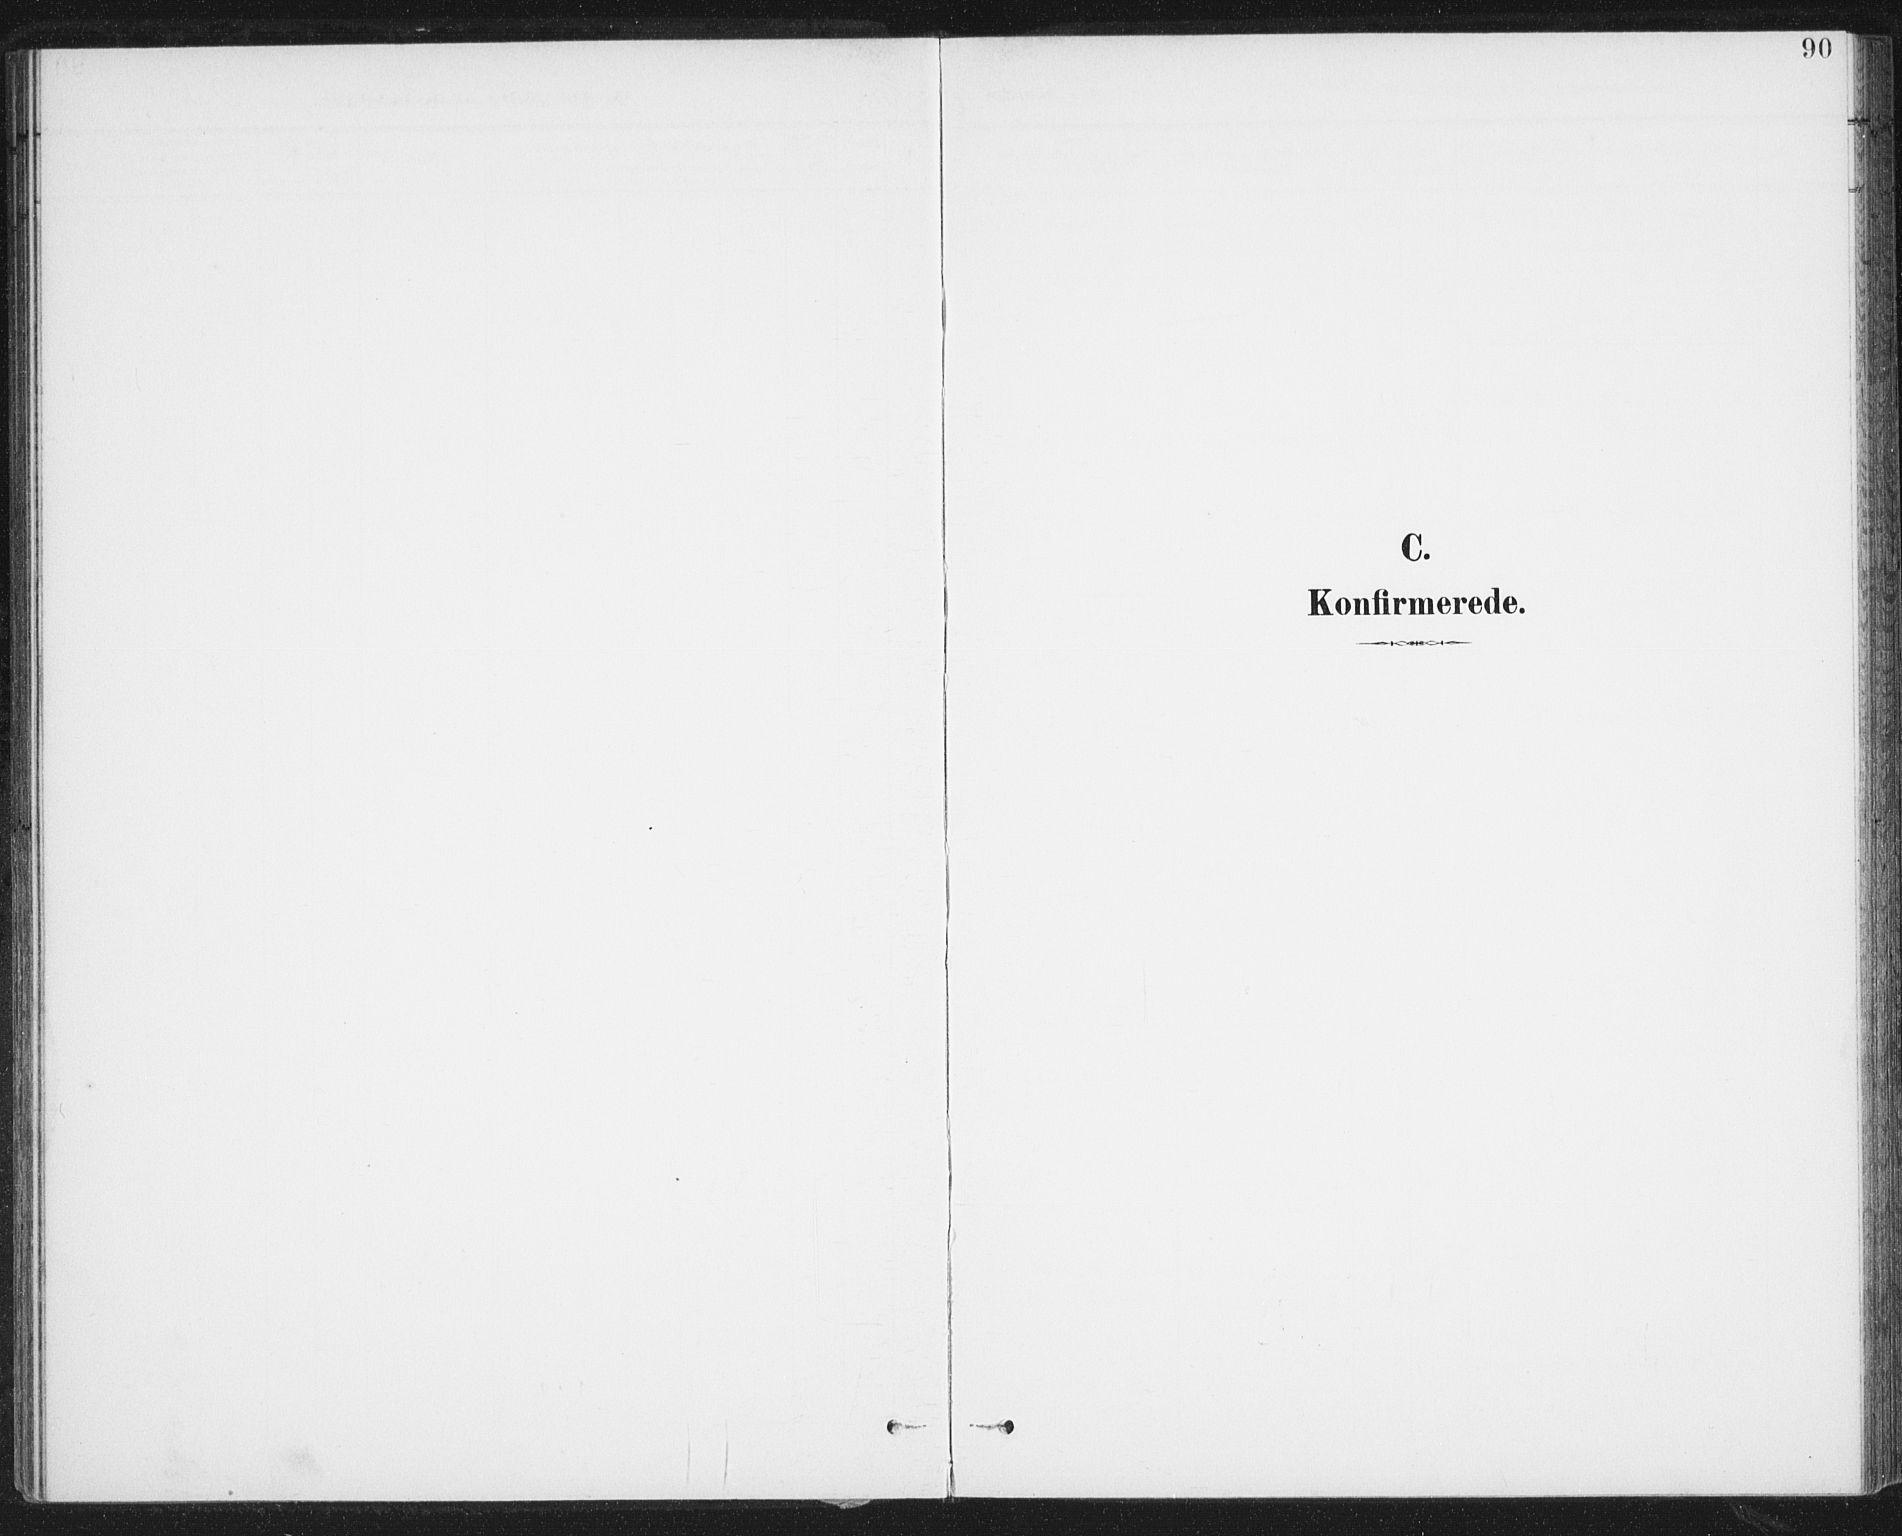 SAT, Ministerialprotokoller, klokkerbøker og fødselsregistre - Nordland, 899/L1437: Ministerialbok nr. 899A05, 1897-1908, s. 90